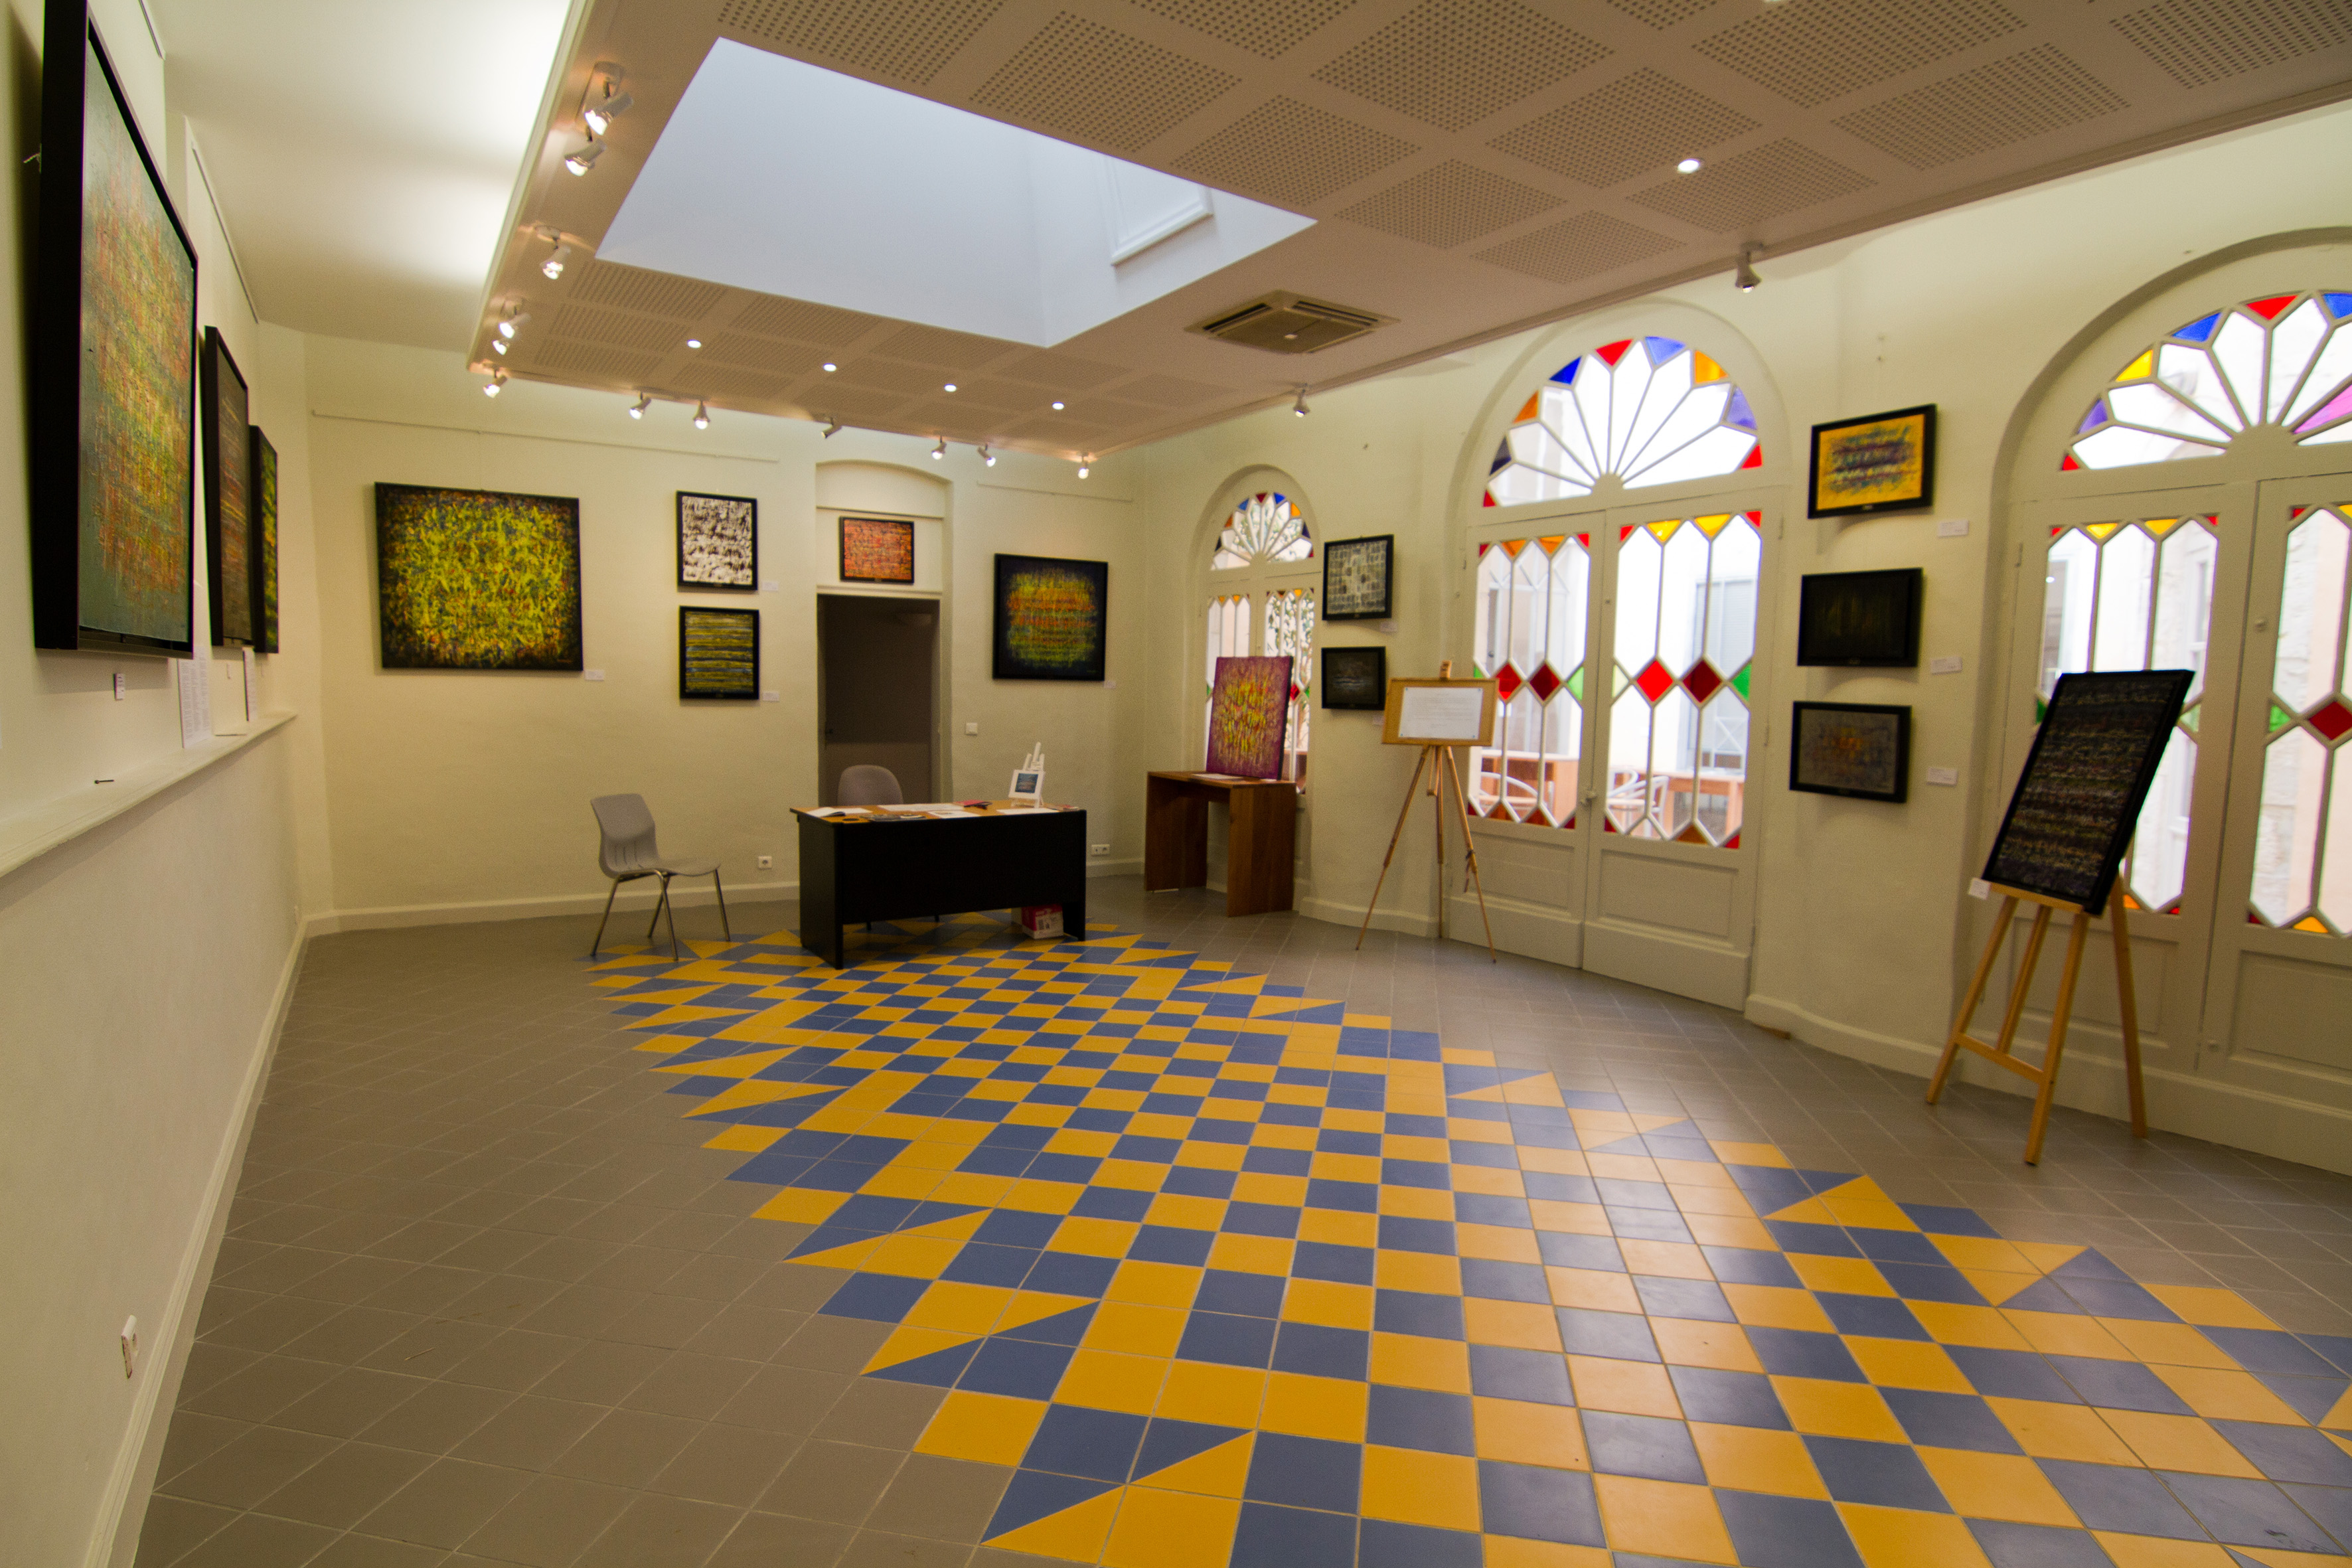 Galerie d'Art l'Arcade Saint-Clar_Jean-Claude Bertrand-5907-170707